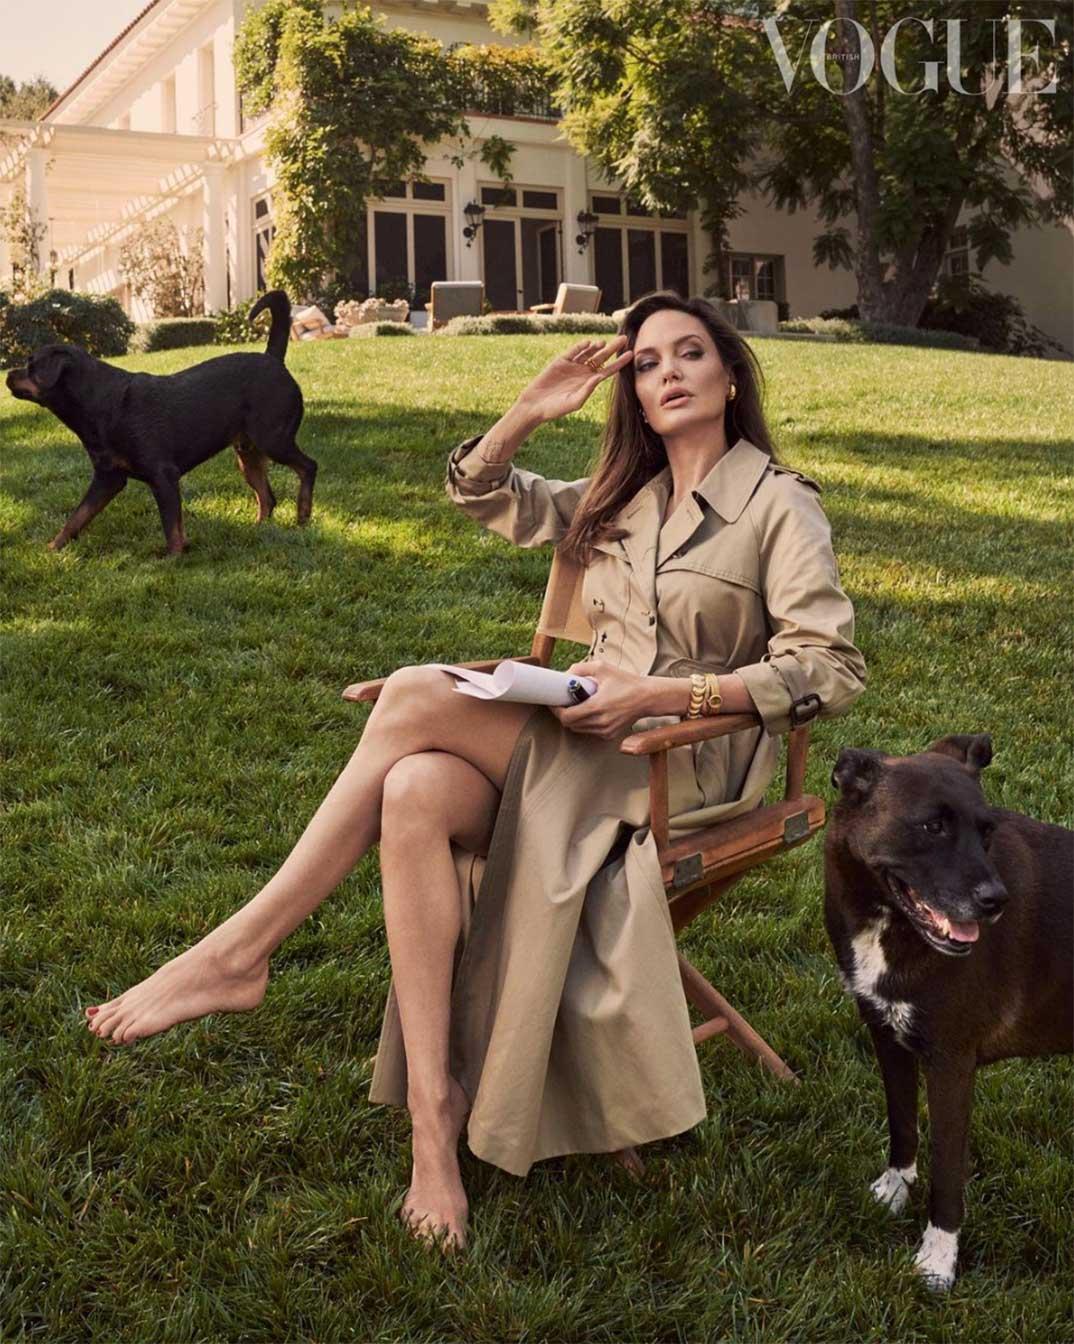 Angelina Jolie © britishvogue/Instagram